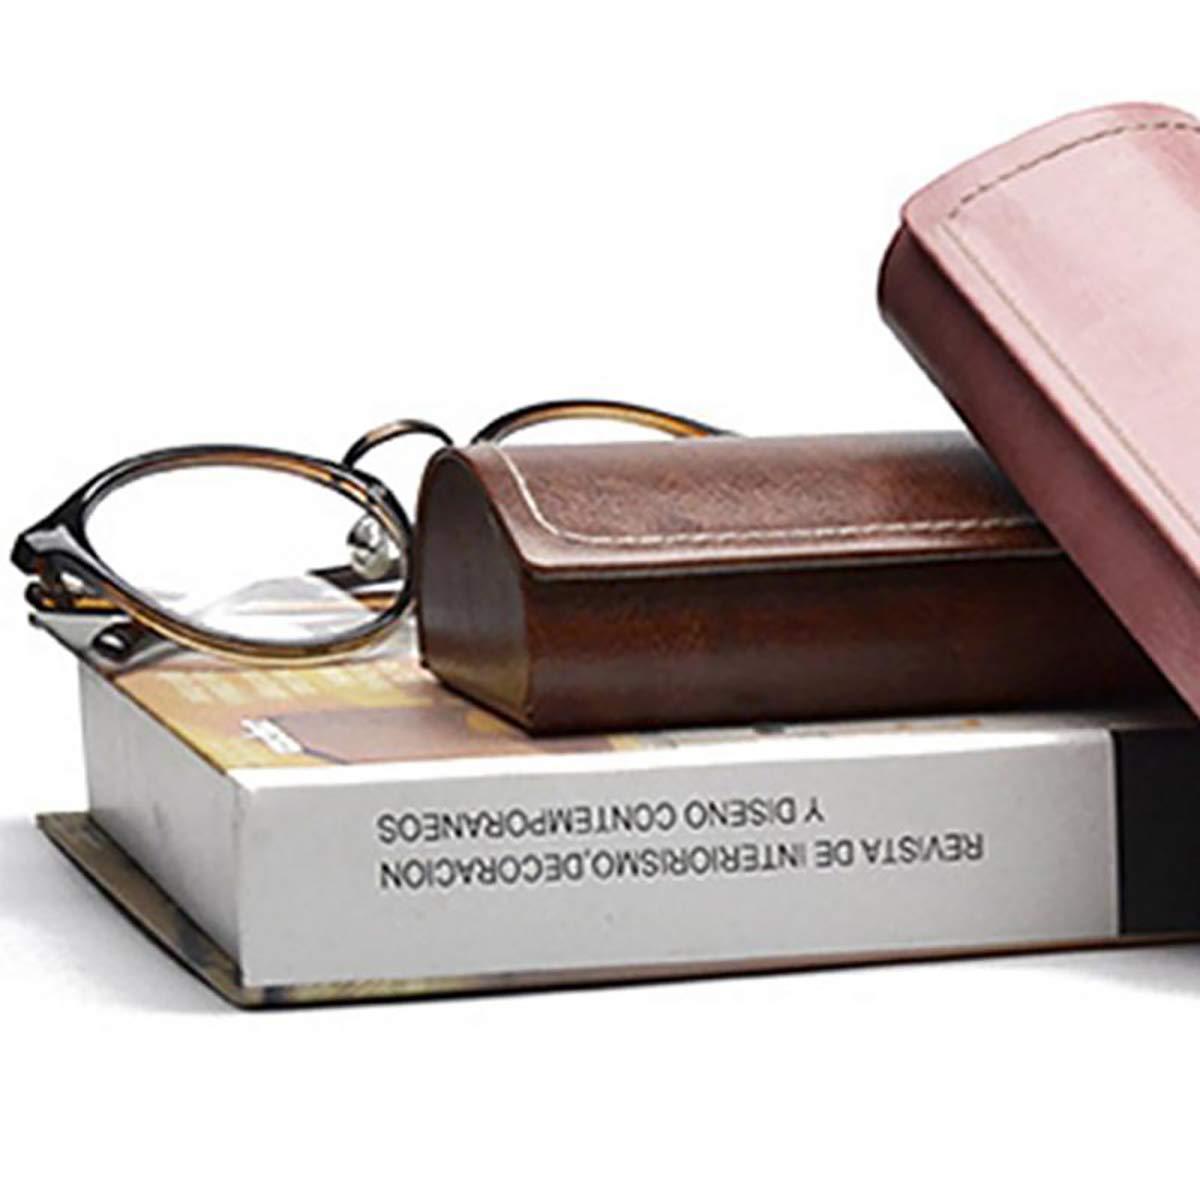 Brown Cozylkx Leather Eyeglass Case Waterproof Hard Case for Sunglasses and Eyeglasses